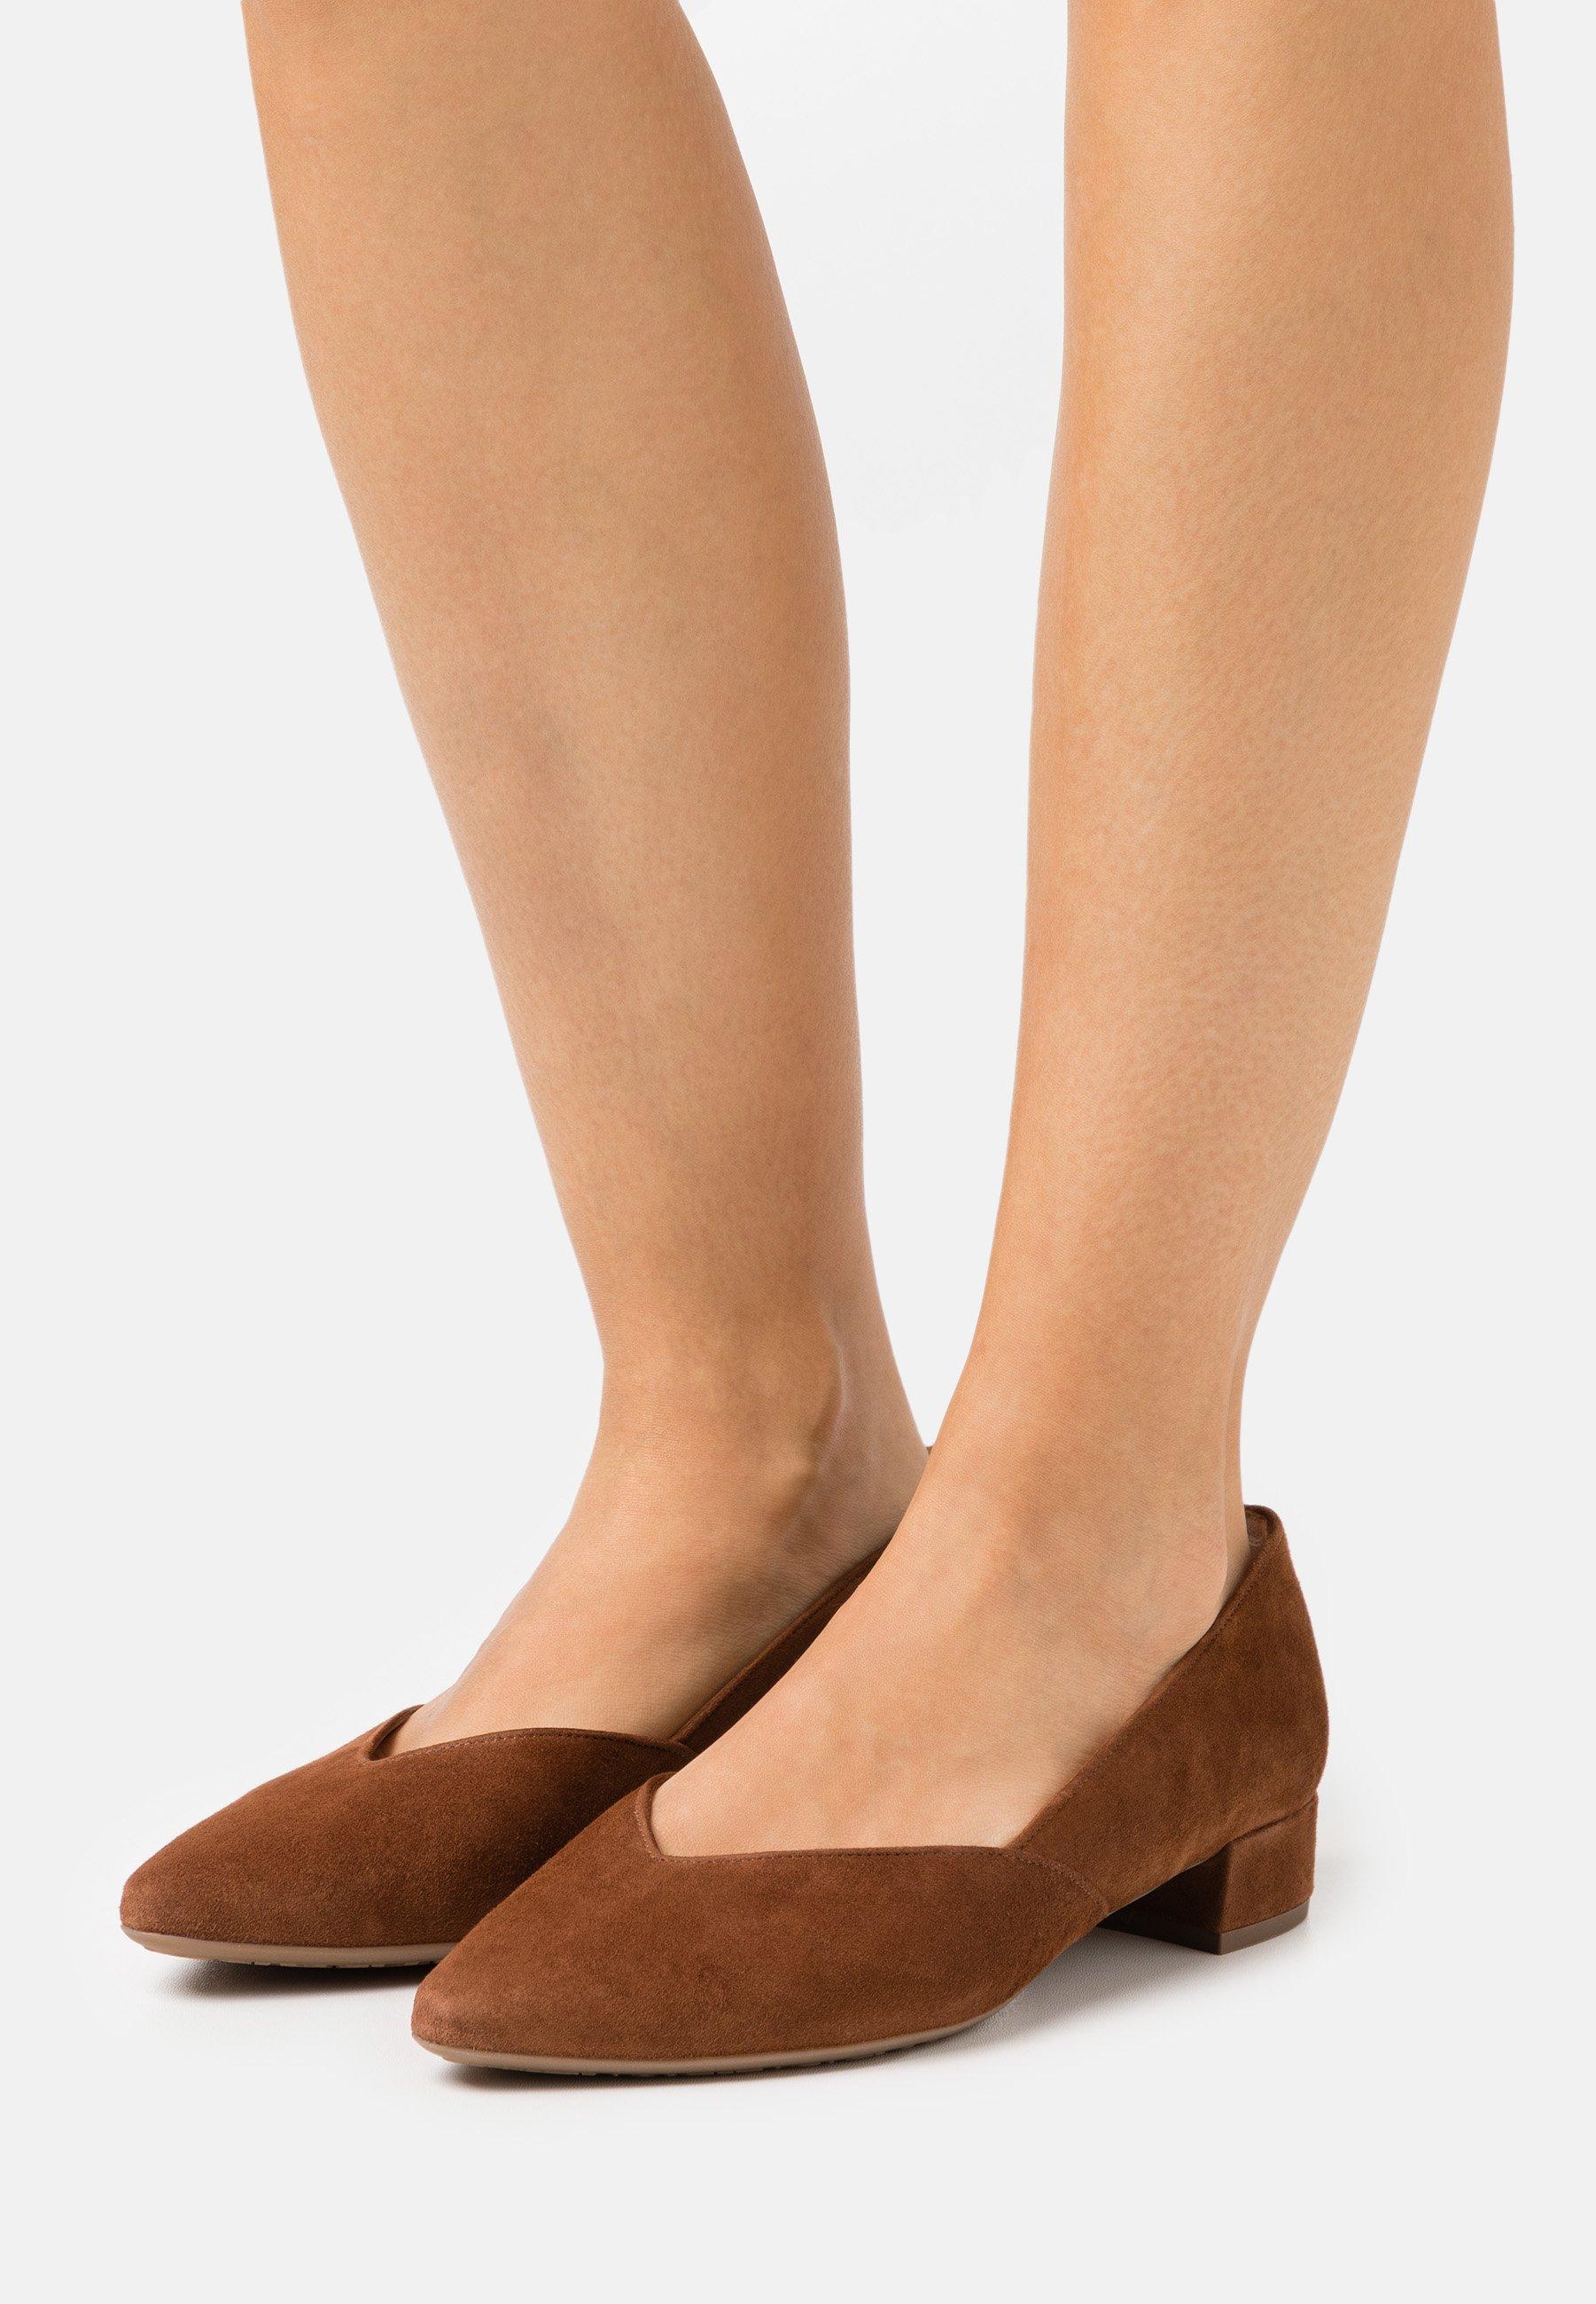 Femme SHADE - Escarpins - sable